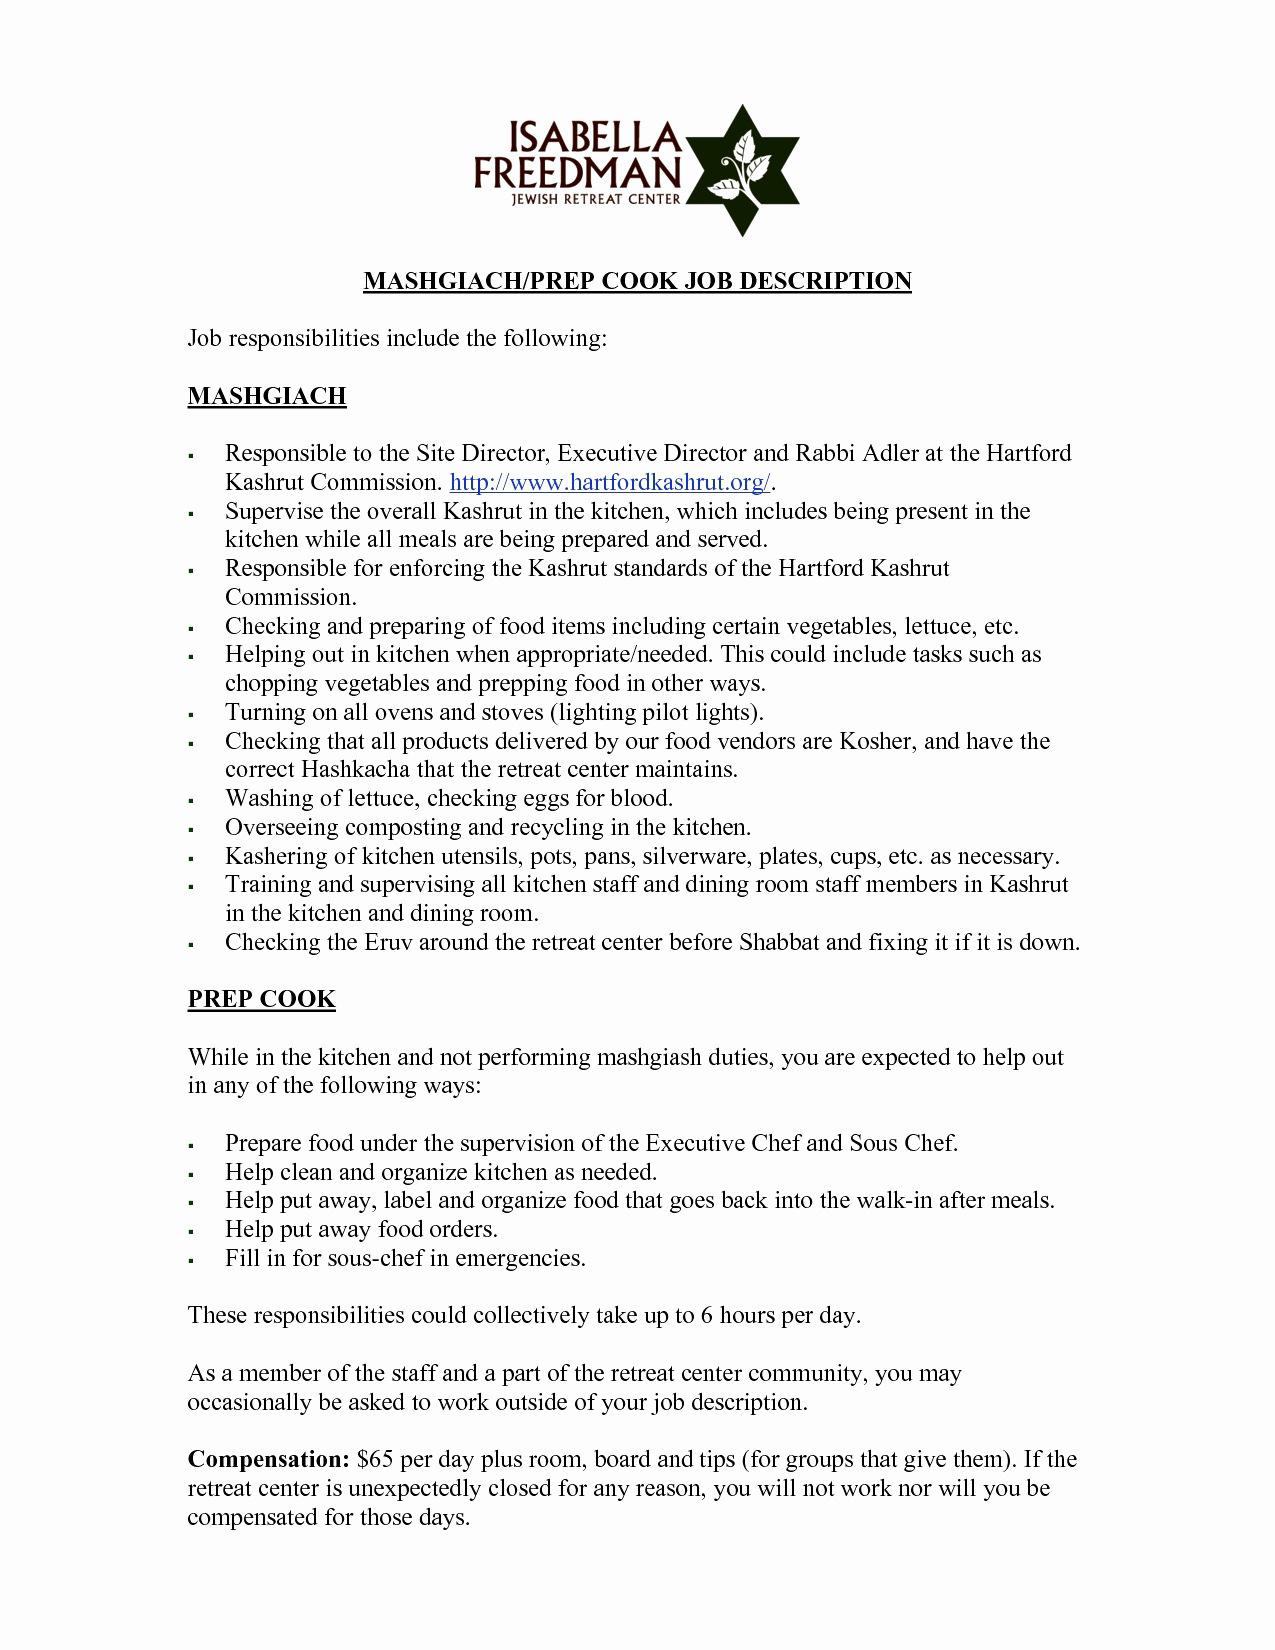 Basic Resume Cover Letter Template - Basic Resume Examples for Jobs Luxury Example Resume Cover Letter